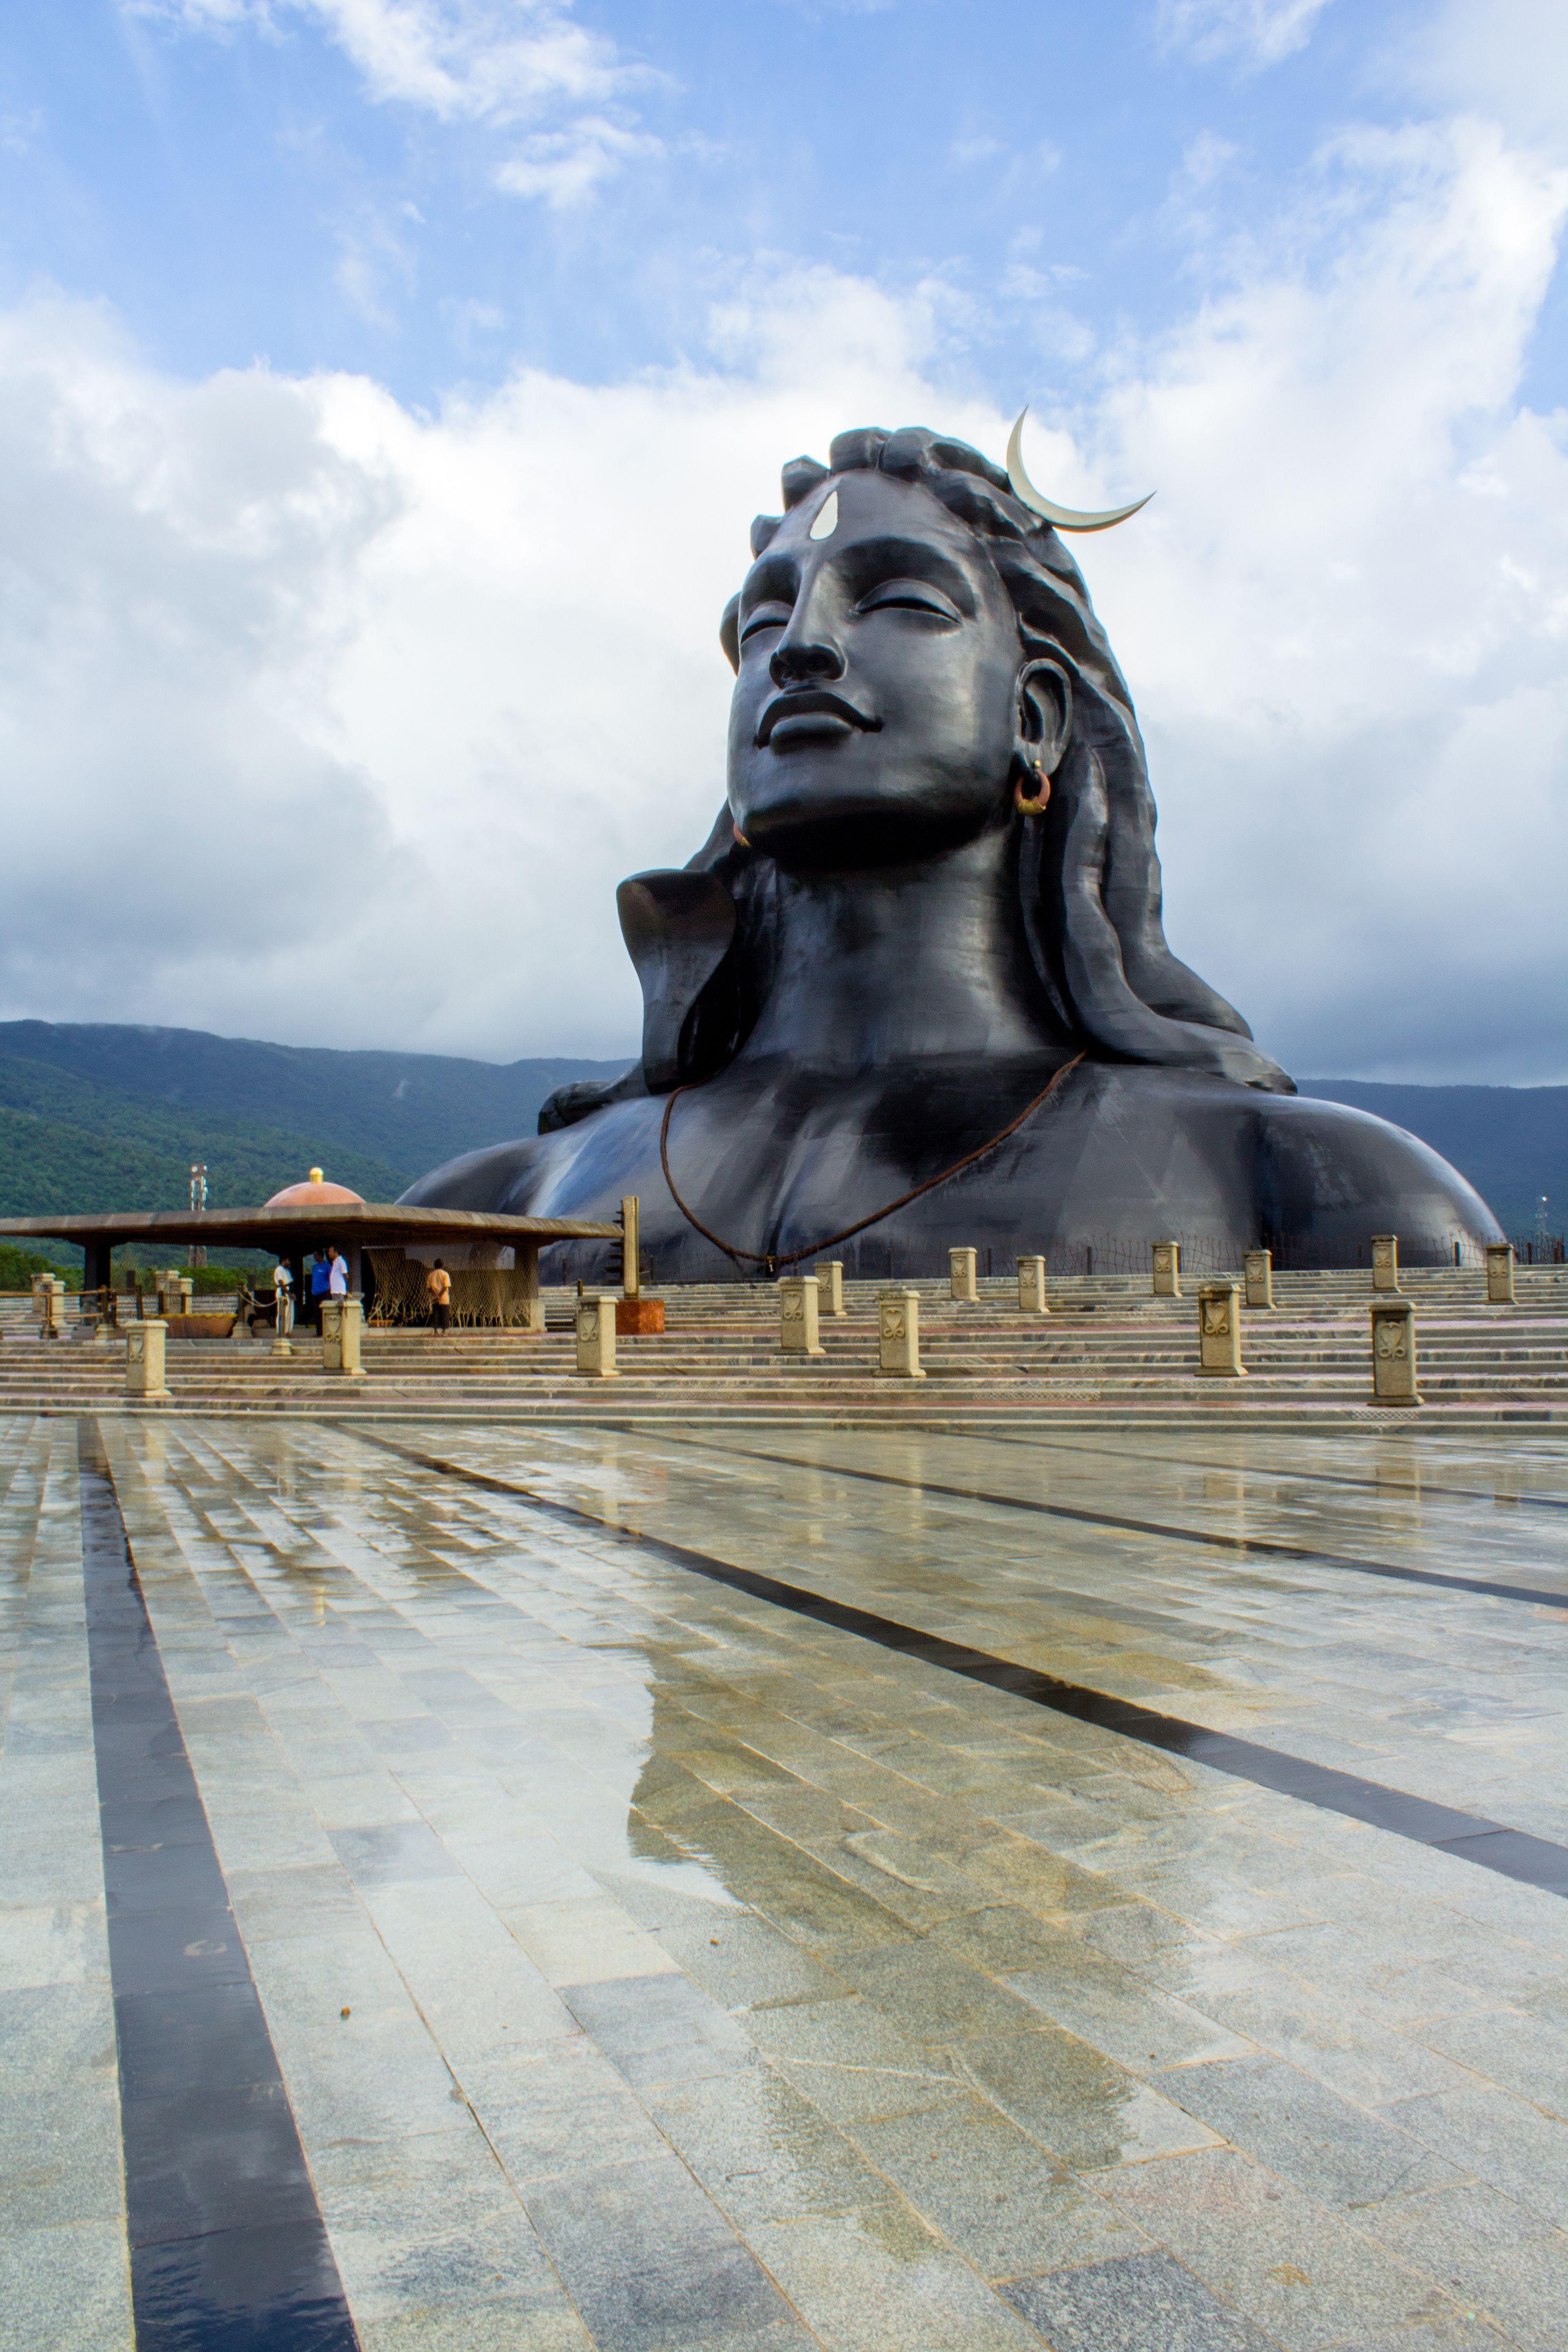 60 Shiva Adiyogi Wallpapers Hd Free Download For Mobile And Desktop Lord Shiva Hd Images Shiva Lord Shiva Painting